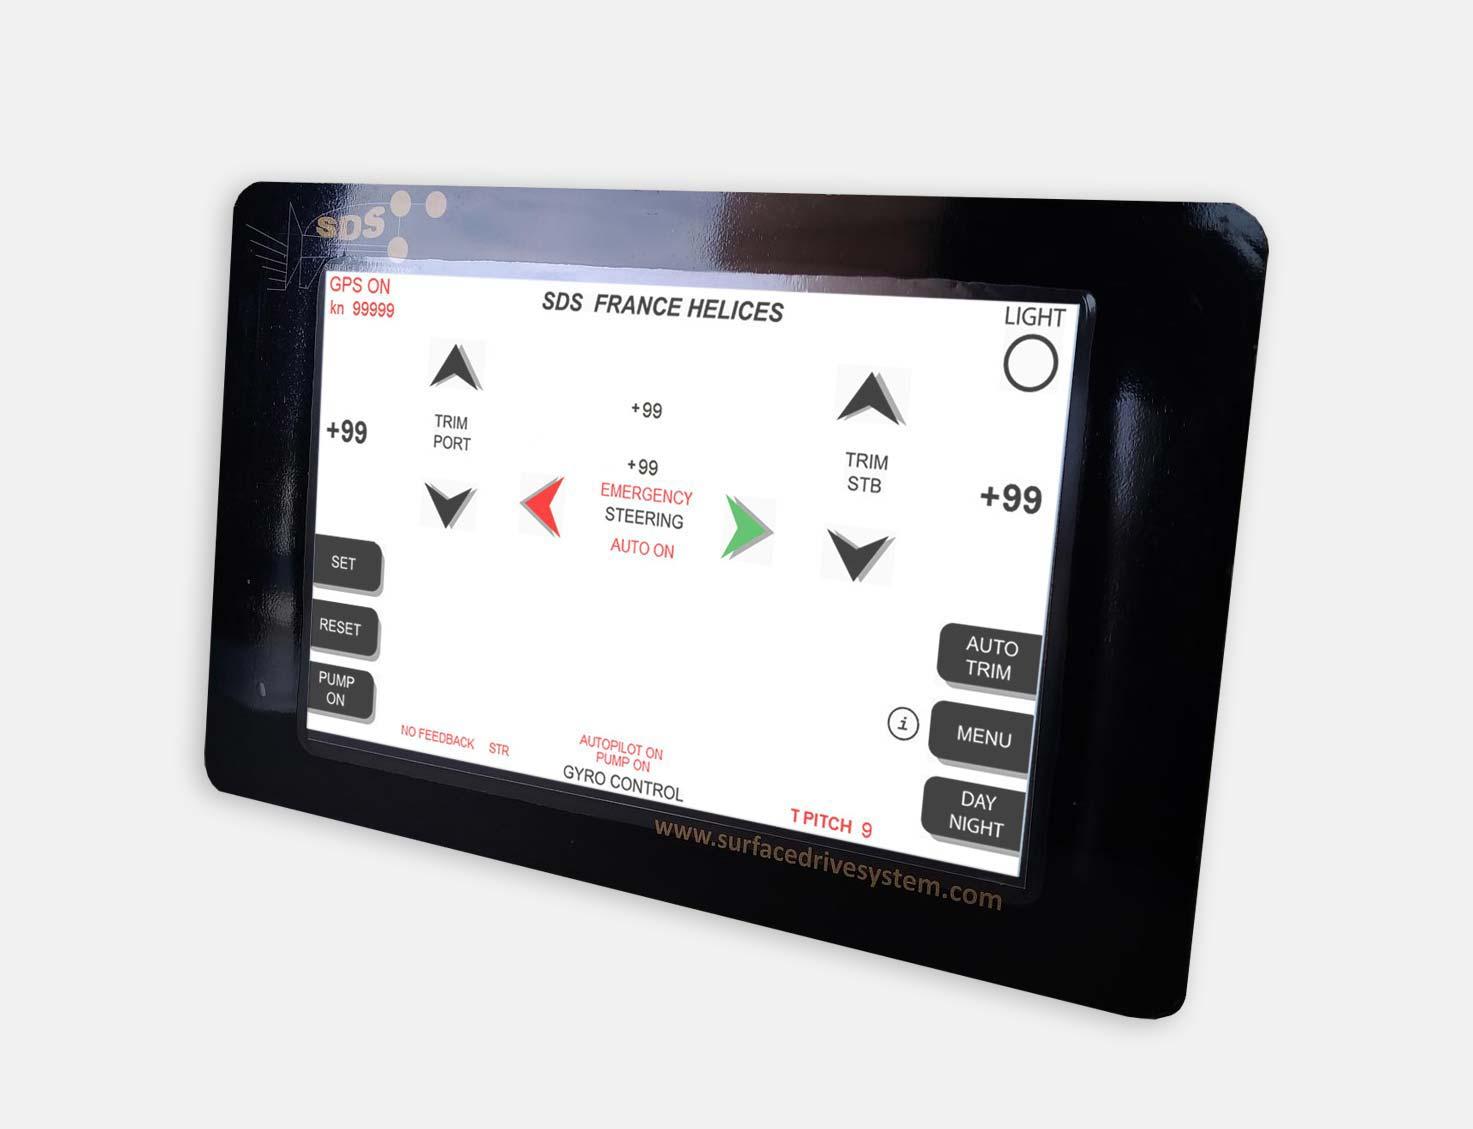 teknosistemi-sds-surface-drive-system-sistemi-elettronici